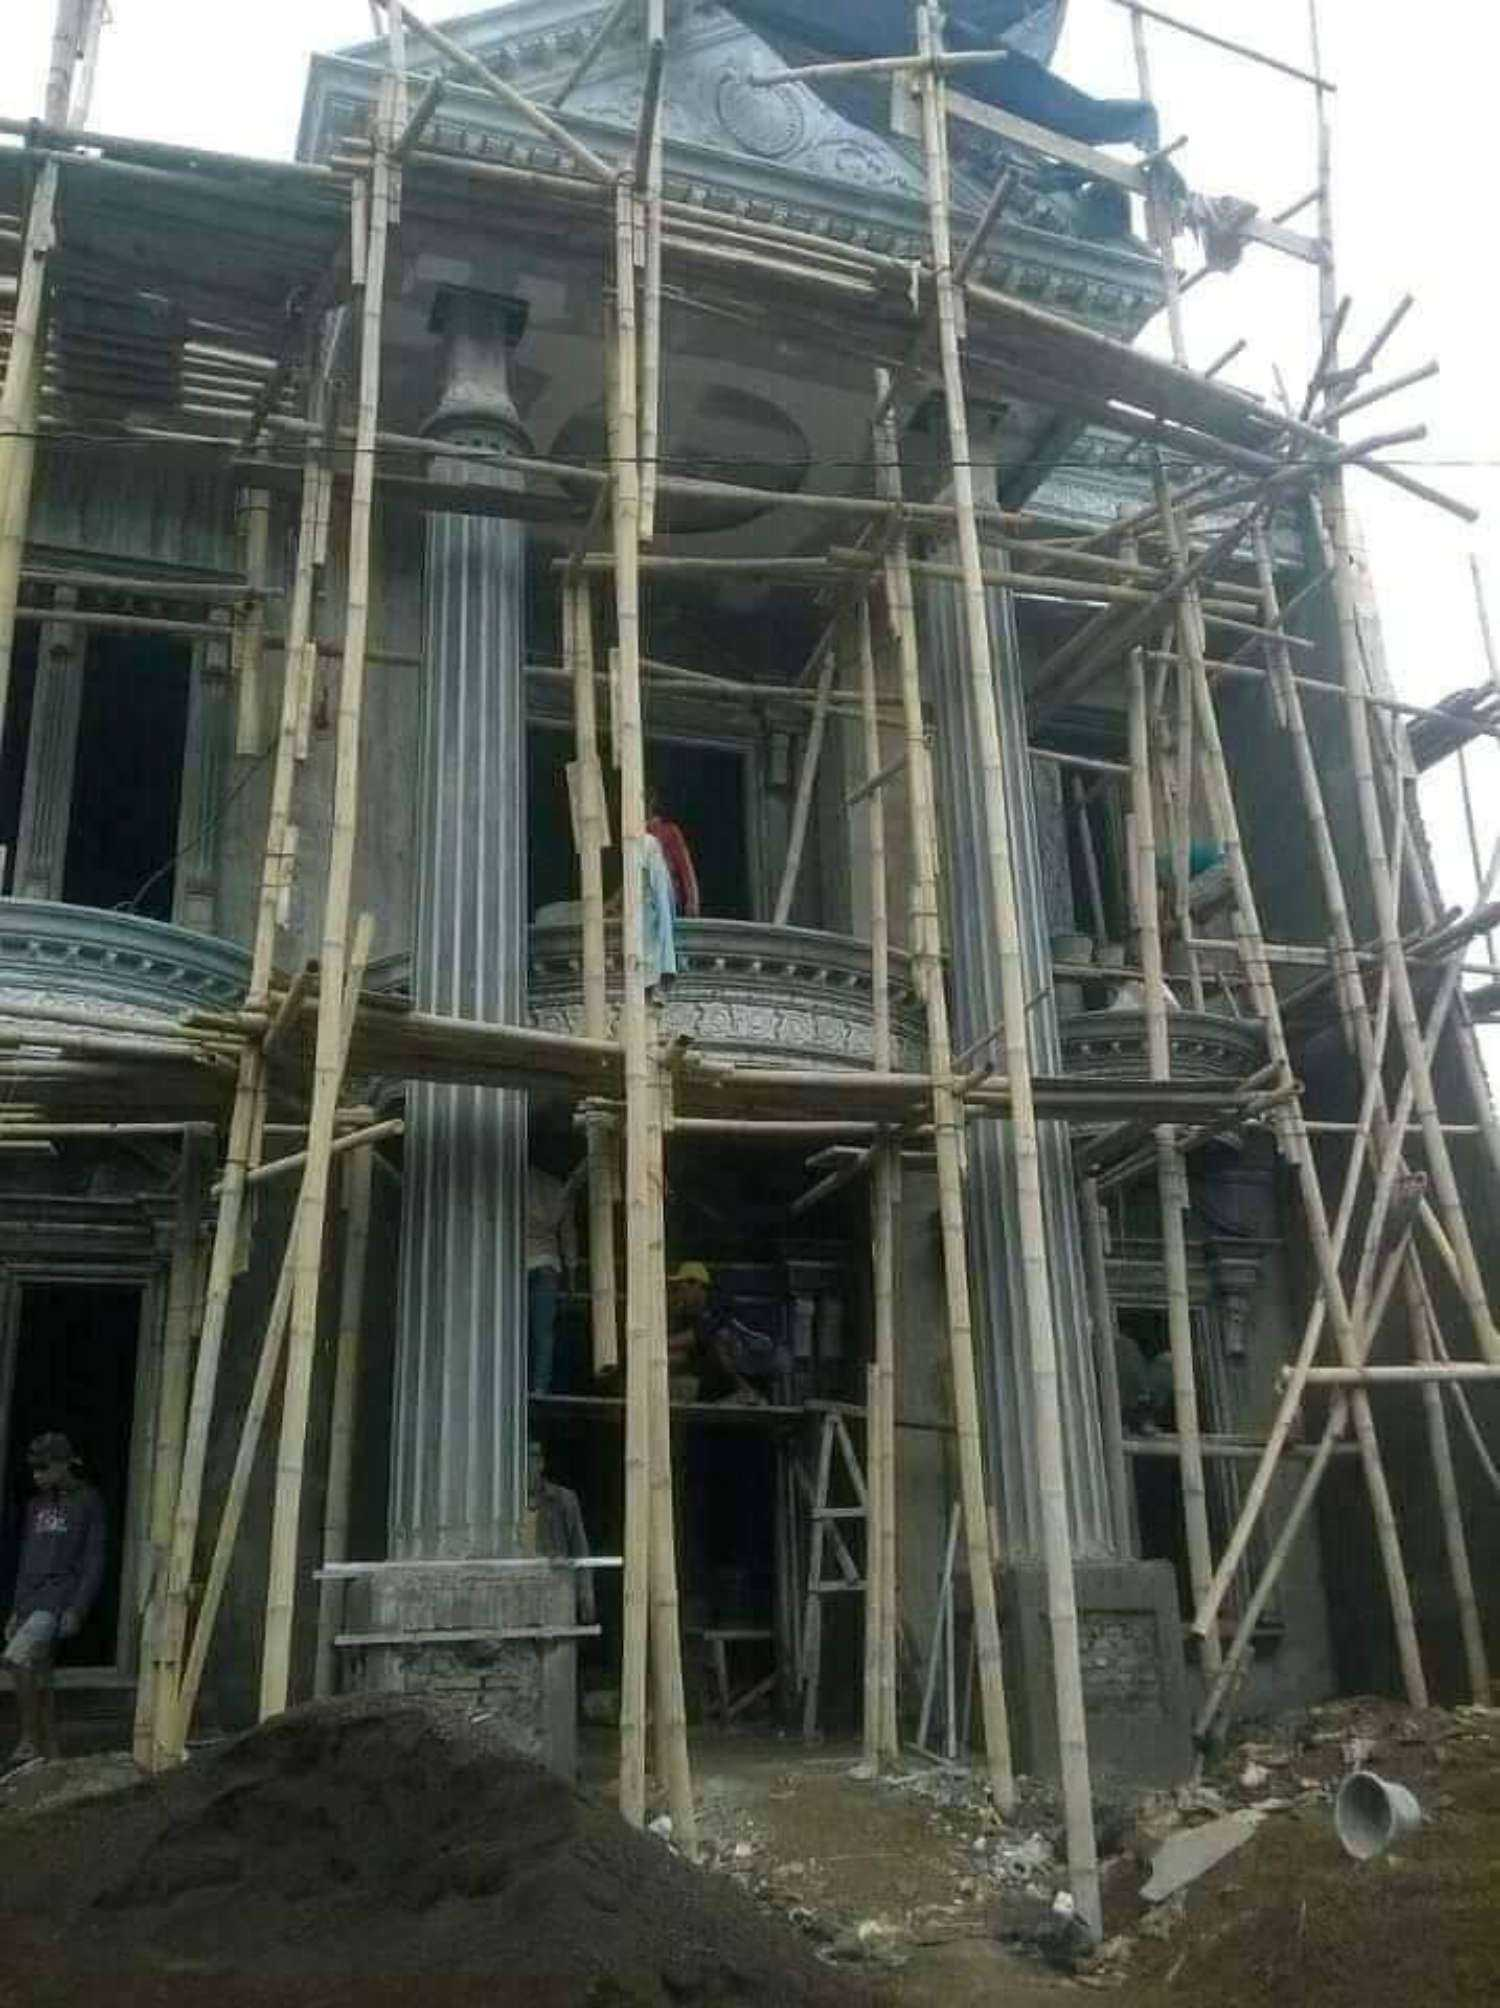 Vanproject Rumah Clasik Modern Cisarua, Kec. Cisarua, Bogor, Jawa Barat, Indonesia Cisarua, Kec. Cisarua, Bogor, Jawa Barat, Indonesia Vanproject-Rumah-Clasik-Modern  132346